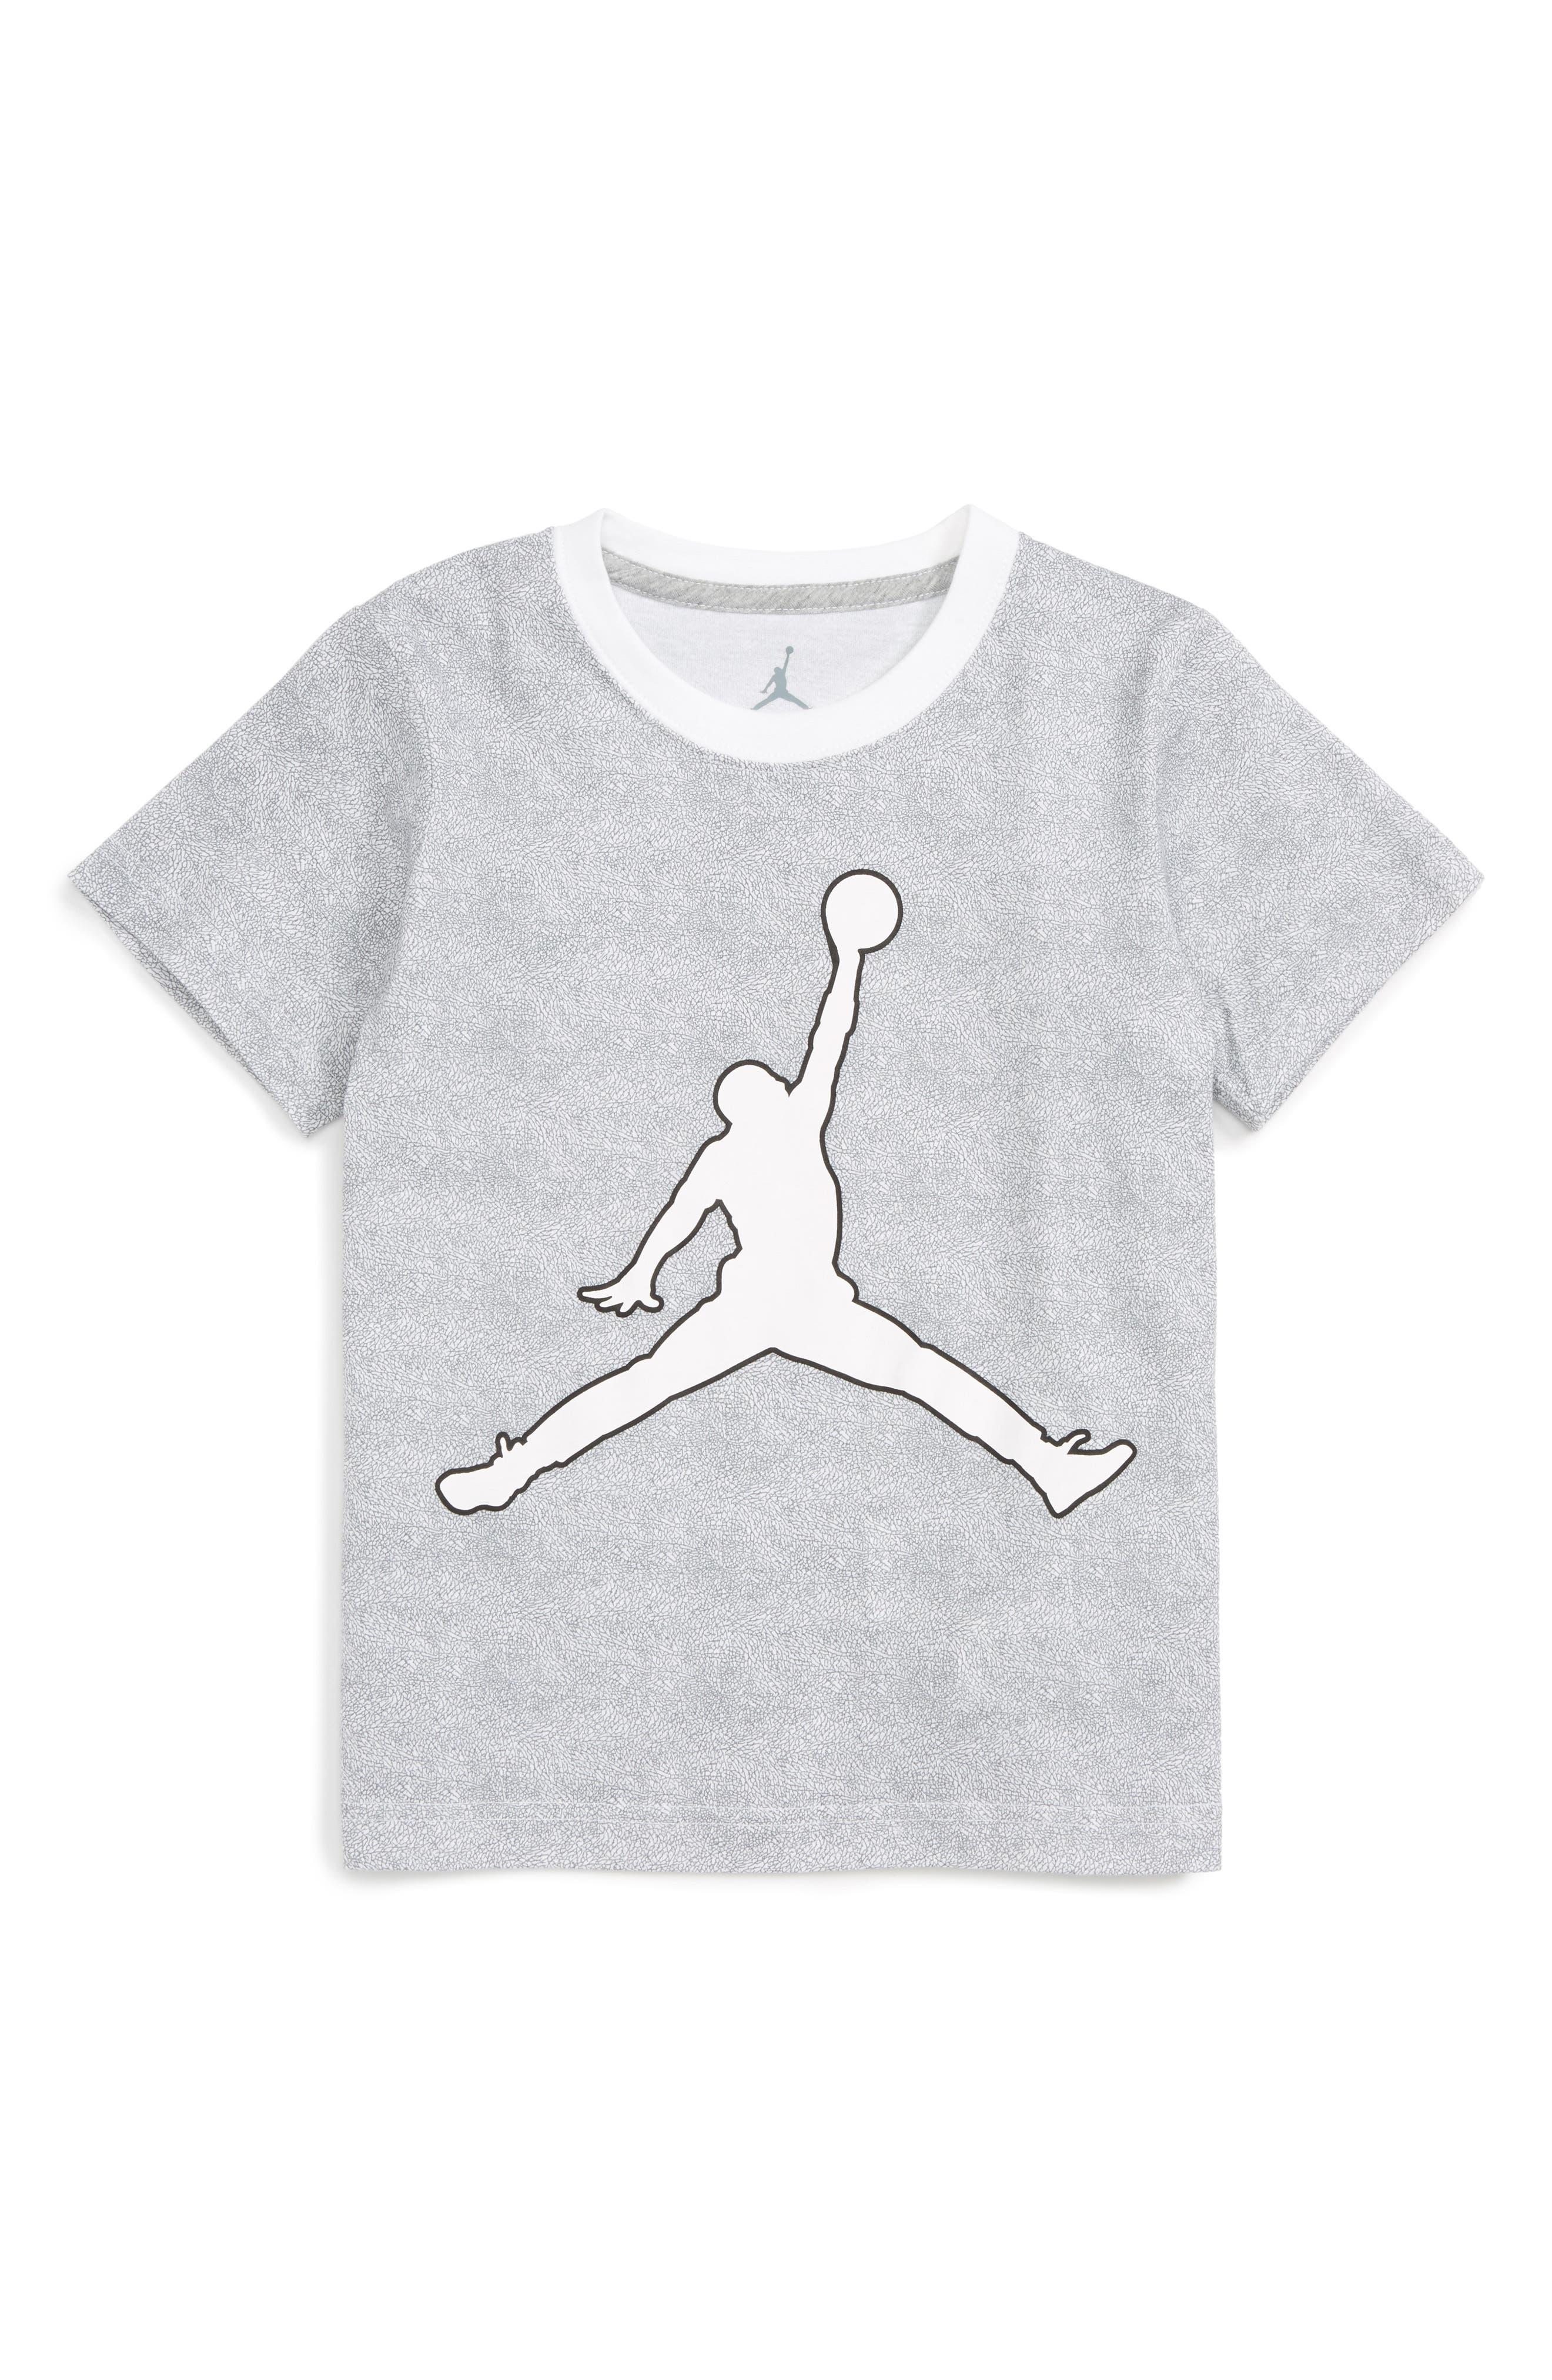 Jordan Jumpman Graphic T-Shirt (Toddler Boys & Little Boys)